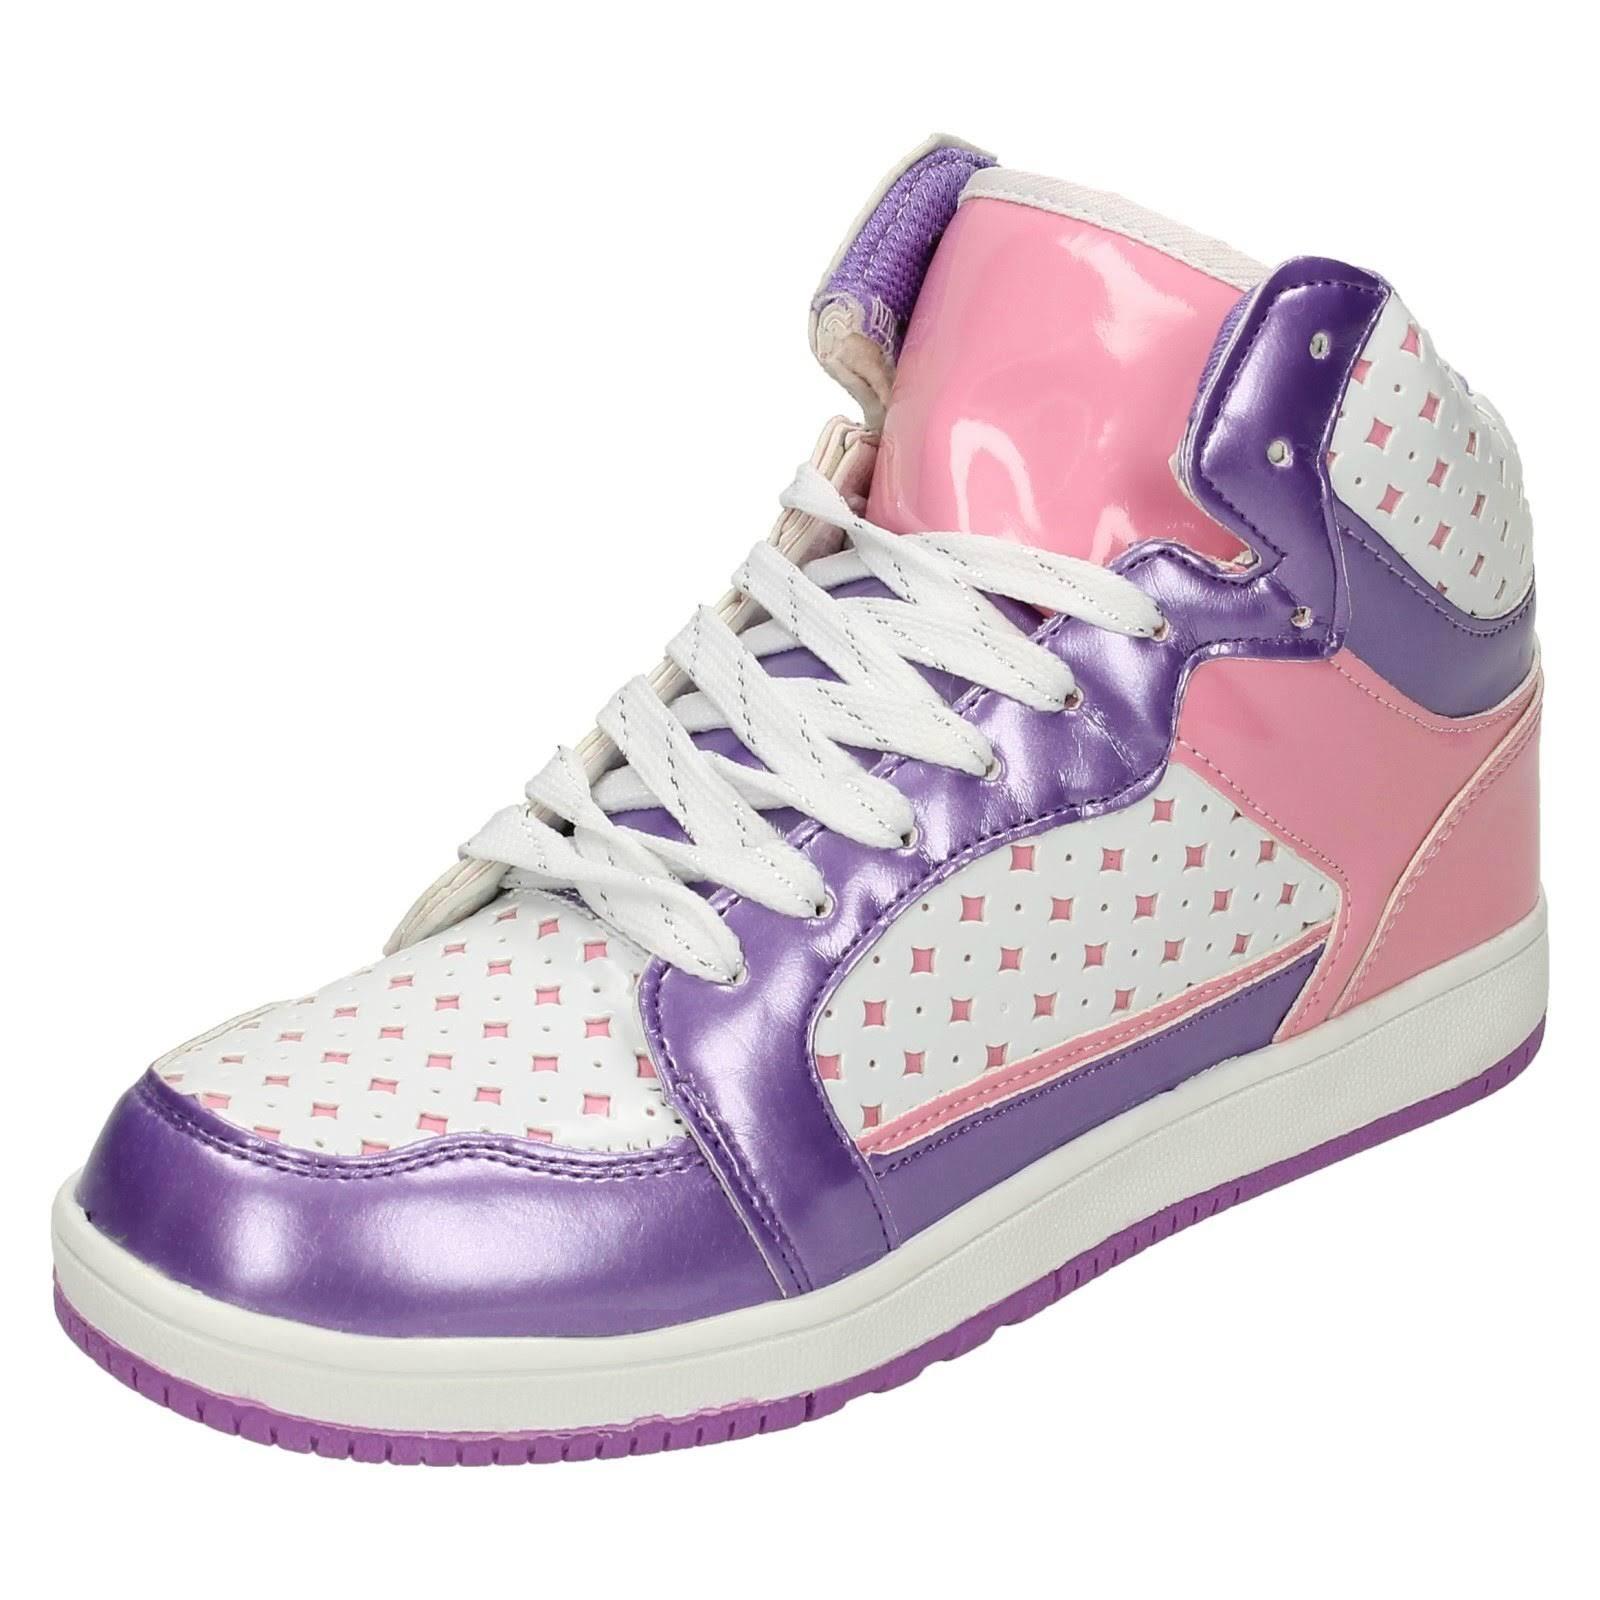 (UK 13 Child, White/Metallic/Pink (White)) Girls Airtech Hi Top Trainers Rebel